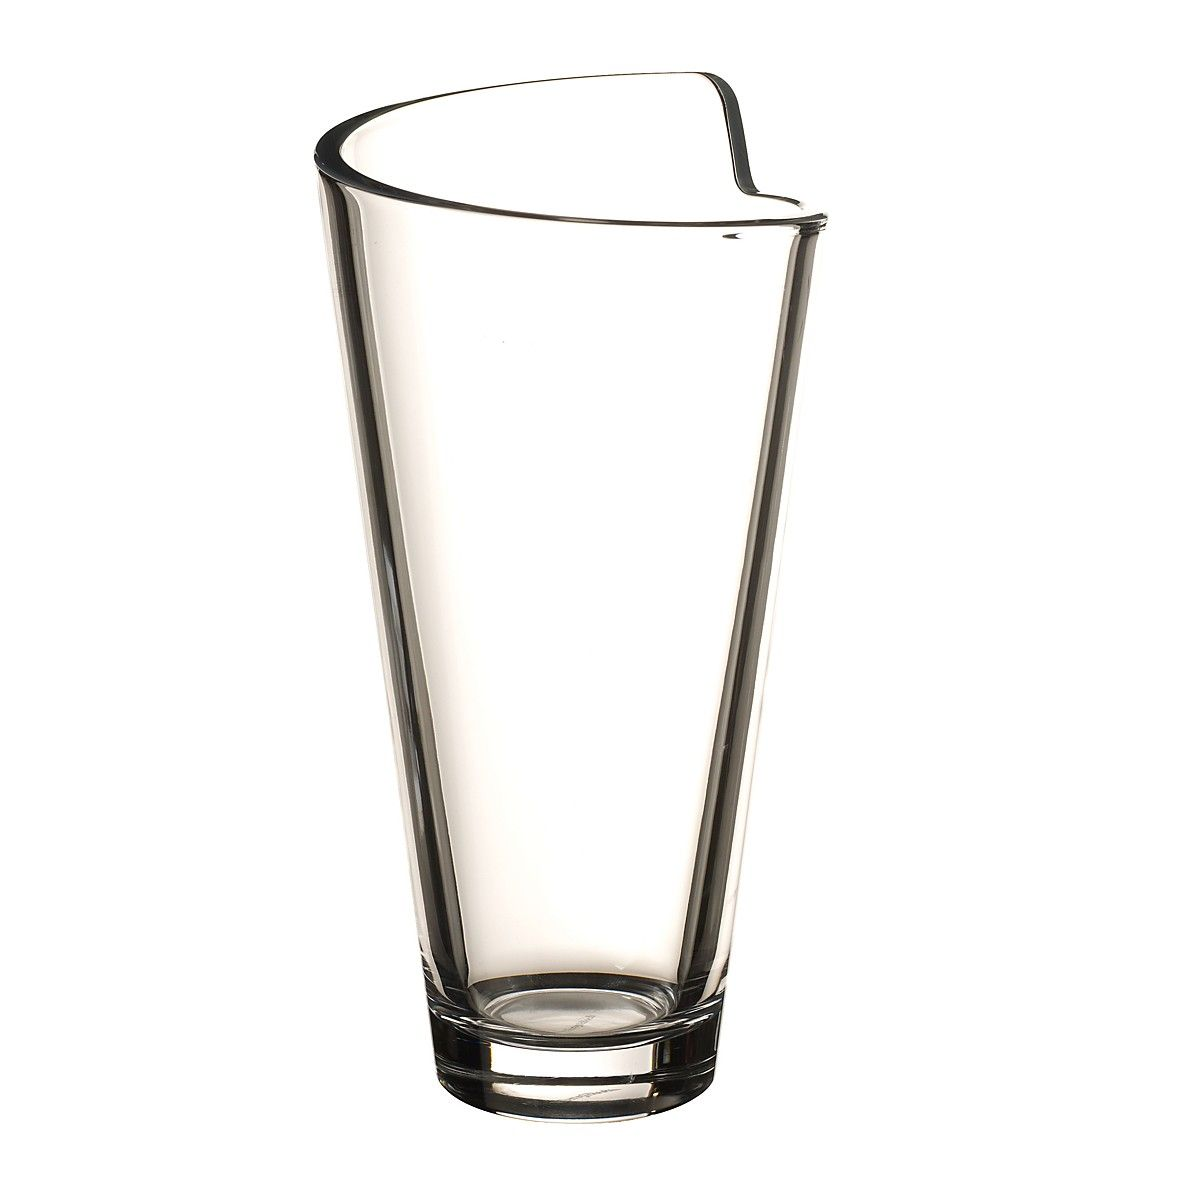 Villeroy boch new wave crystal vase bloomingdales design villeroy boch new wave crystal vase bloomingdales reviewsmspy